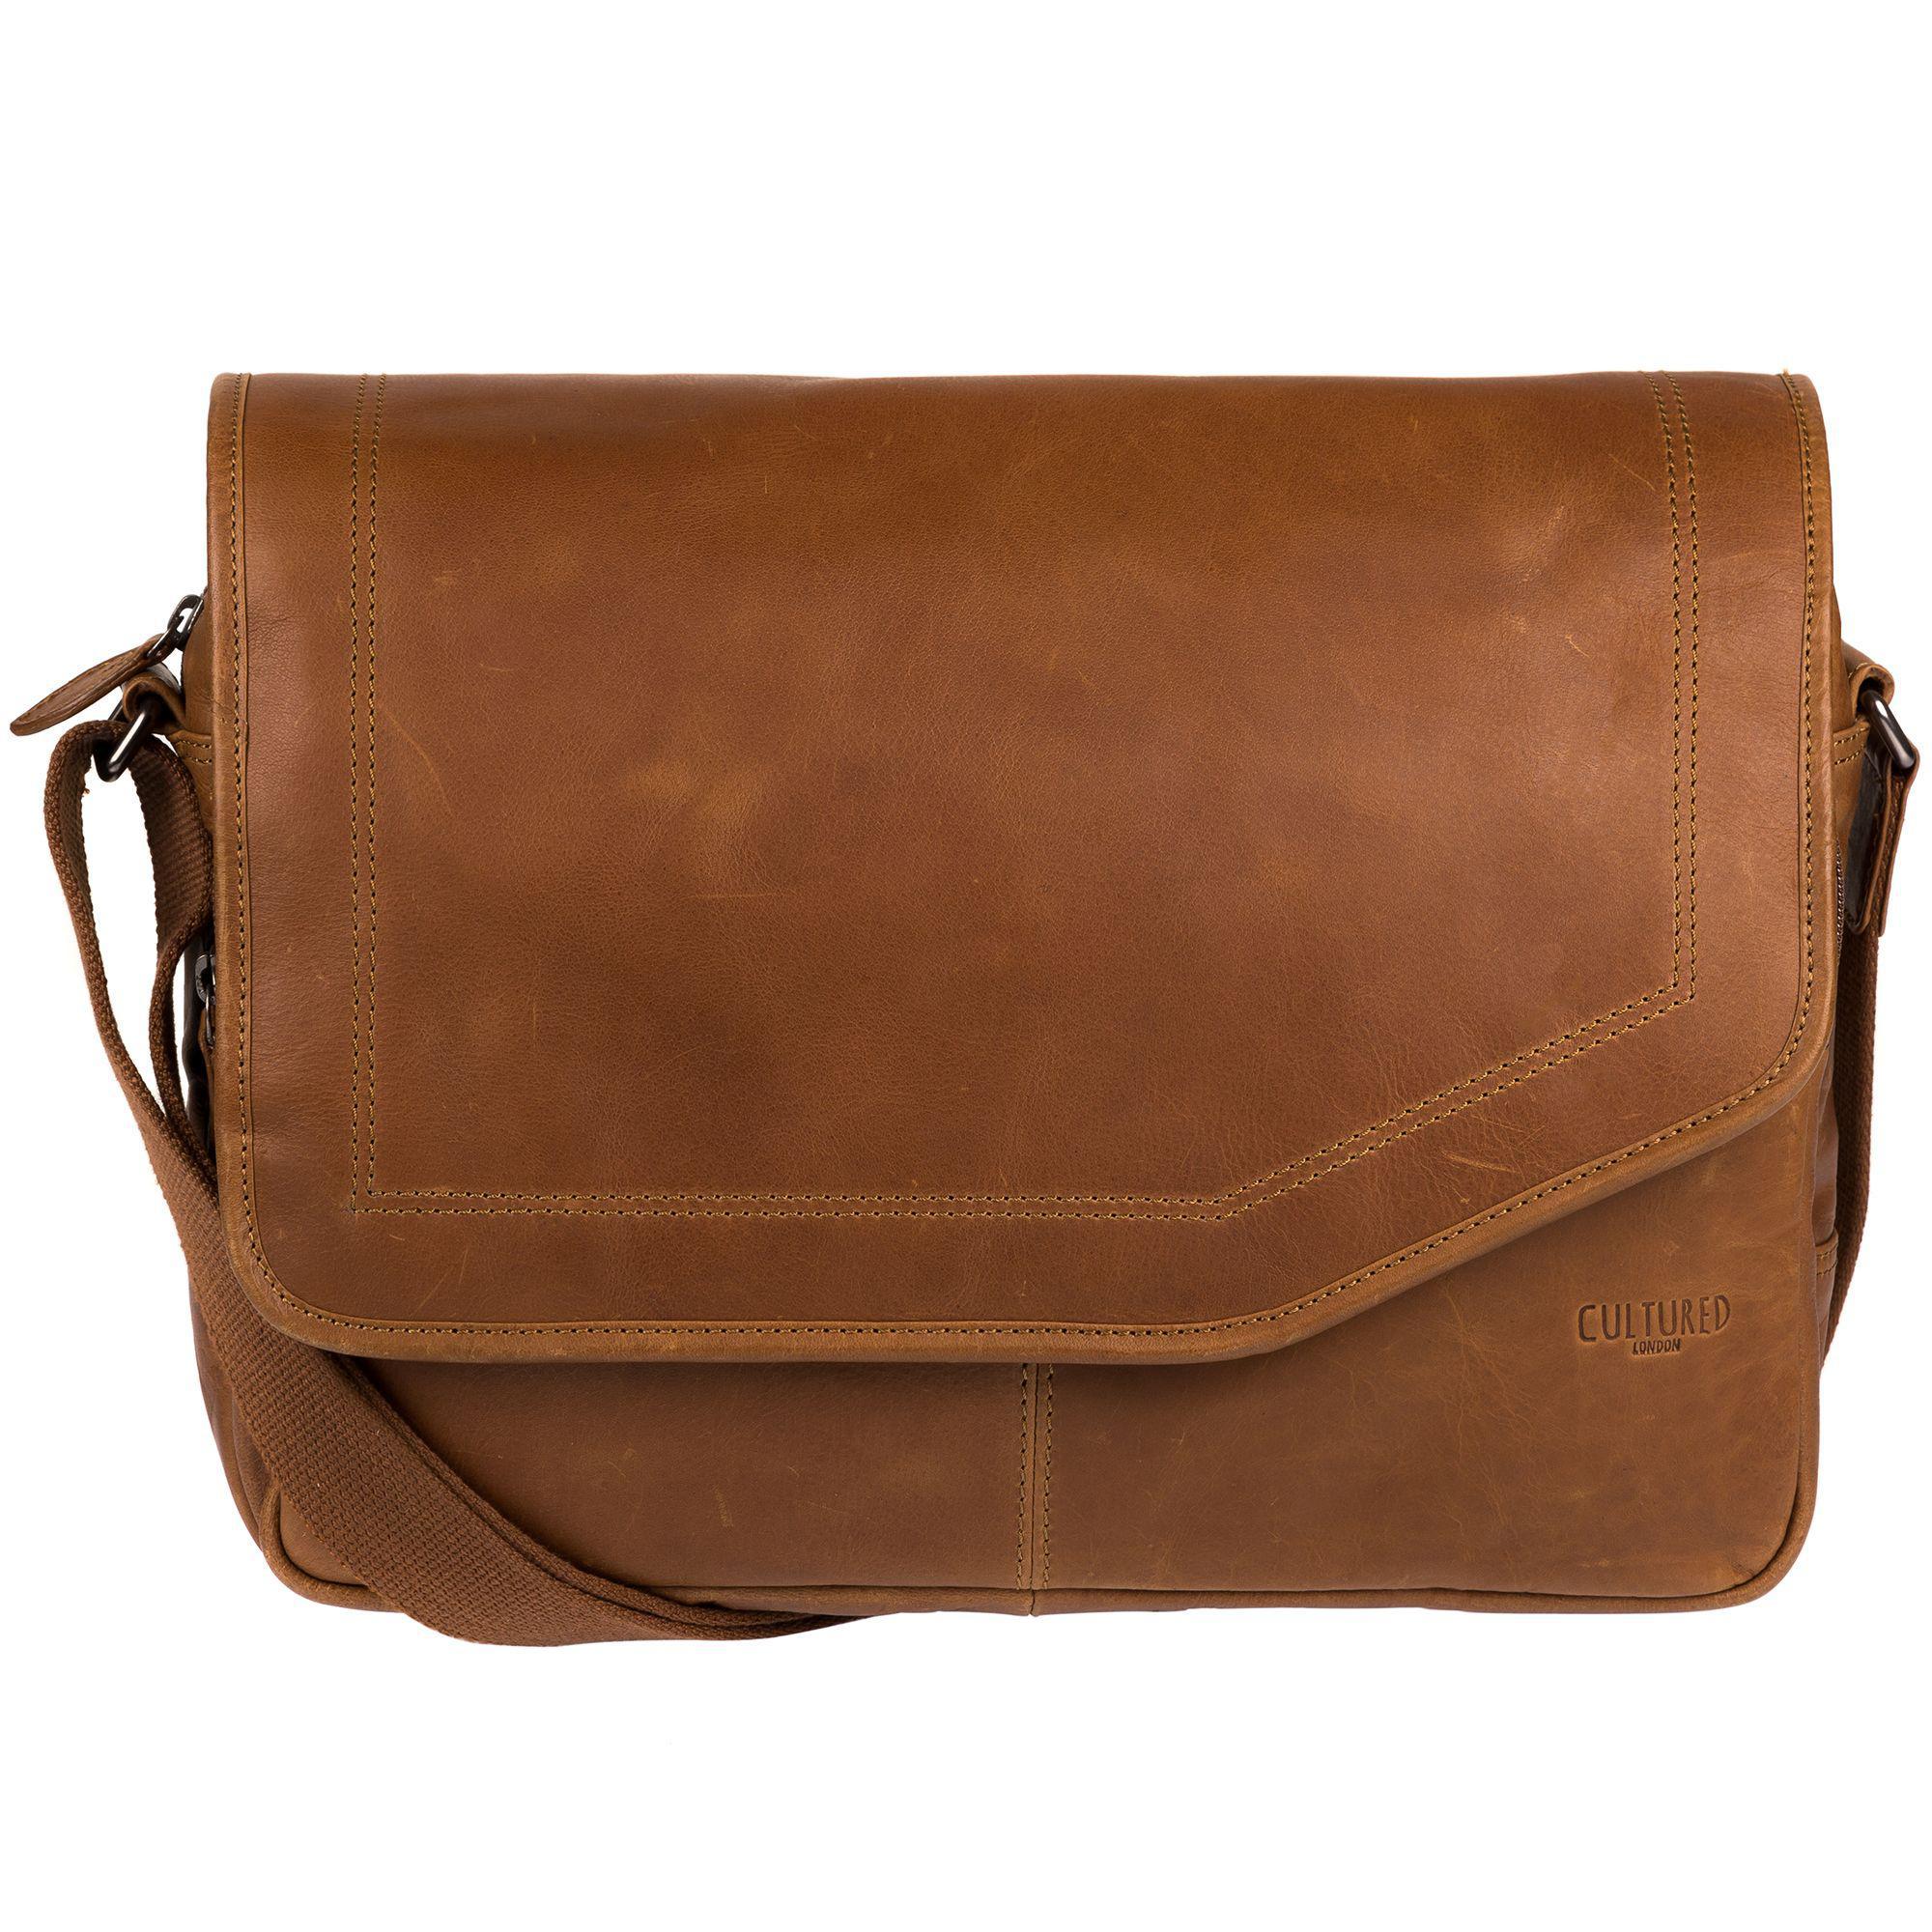 9145764b19 Cultured London Chestnut  reaction  Buffalo Leather Messenger Bag in ...